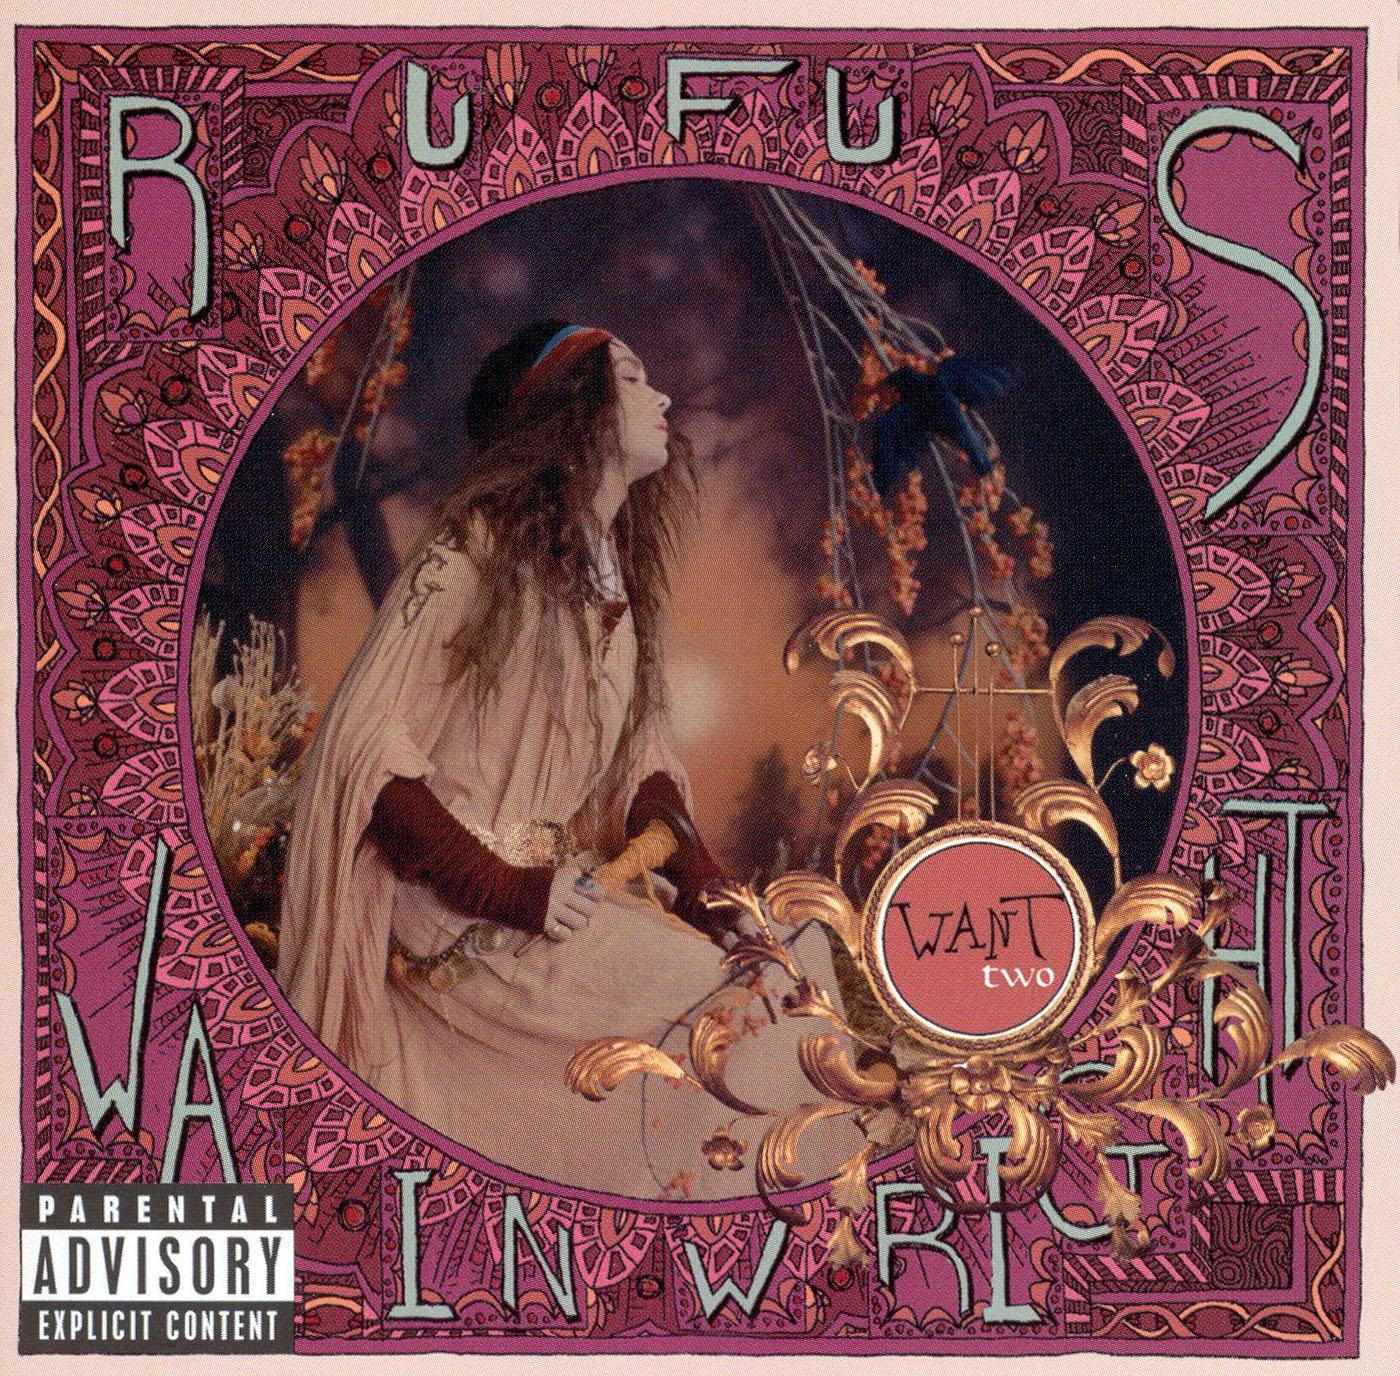 Rufus Wainwright Live at the Filmore